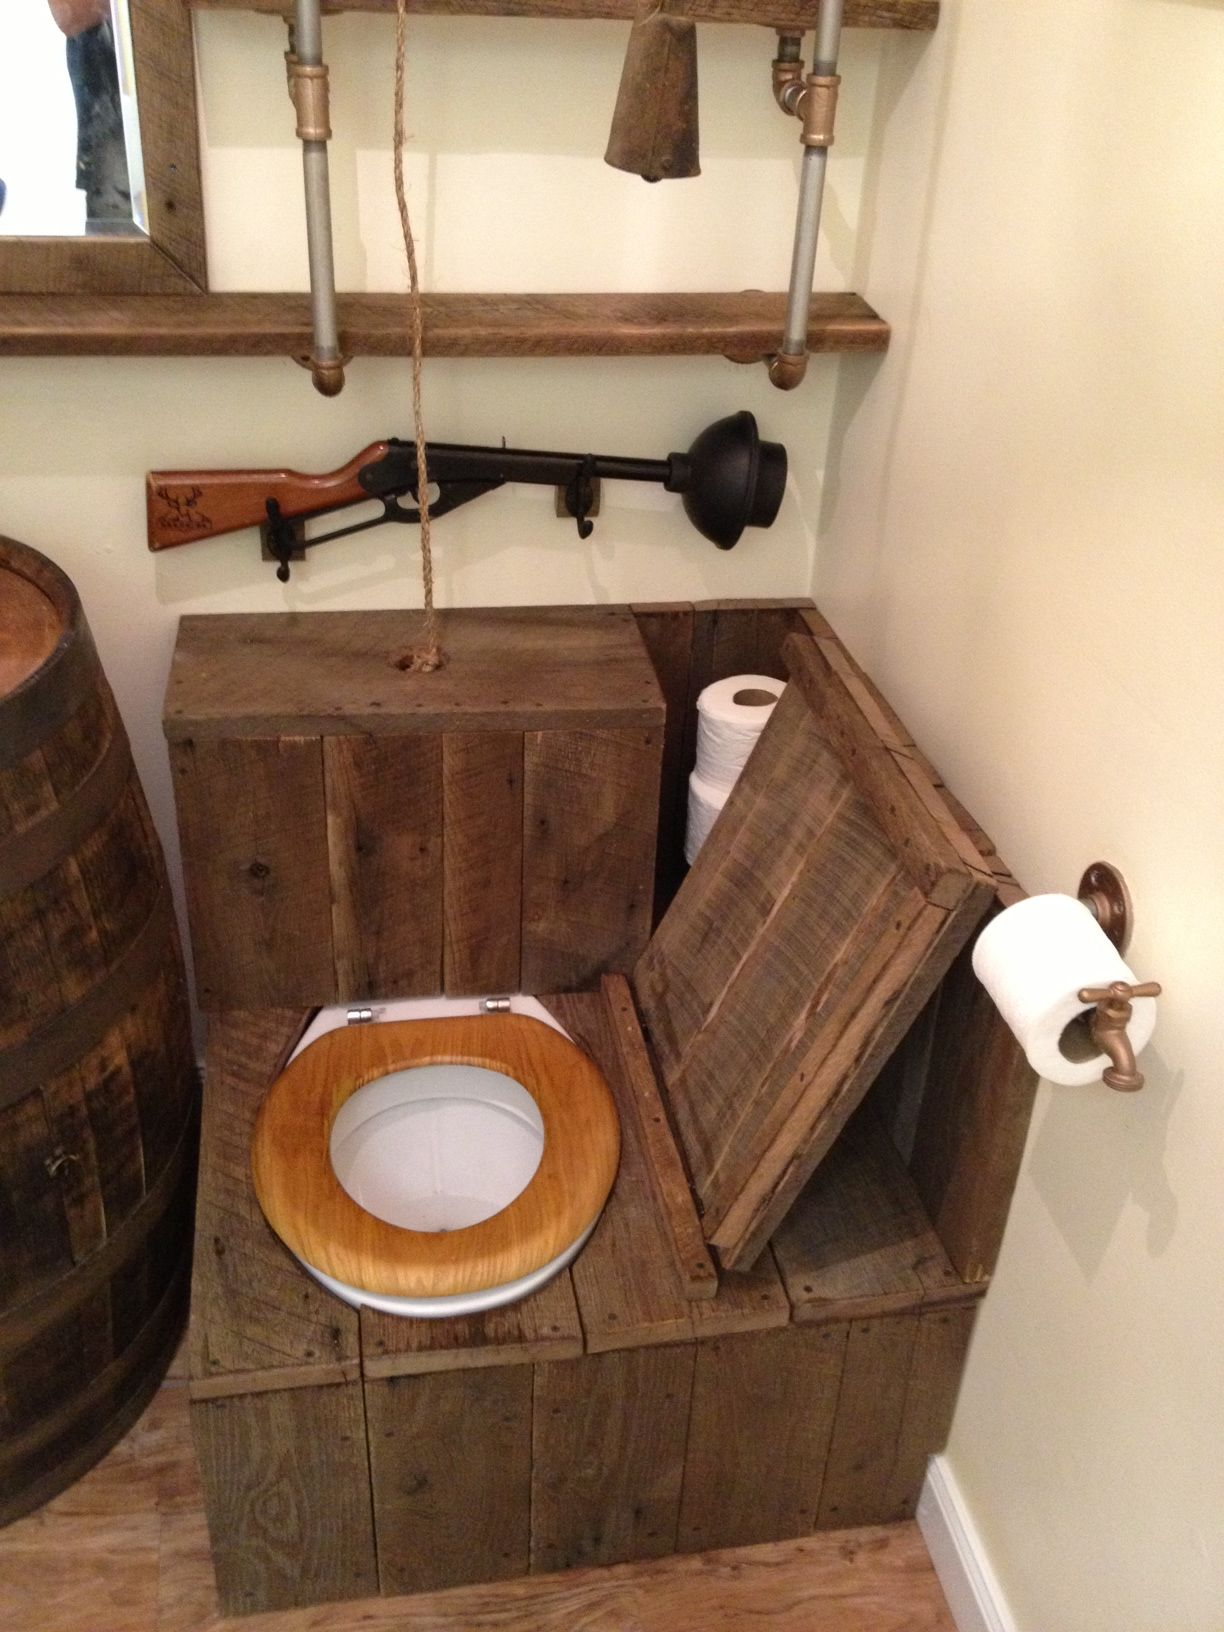 Barrel Sink Rustic Toilet Opened The Ultimate Redneck Bathroom In 2019 Pinterest